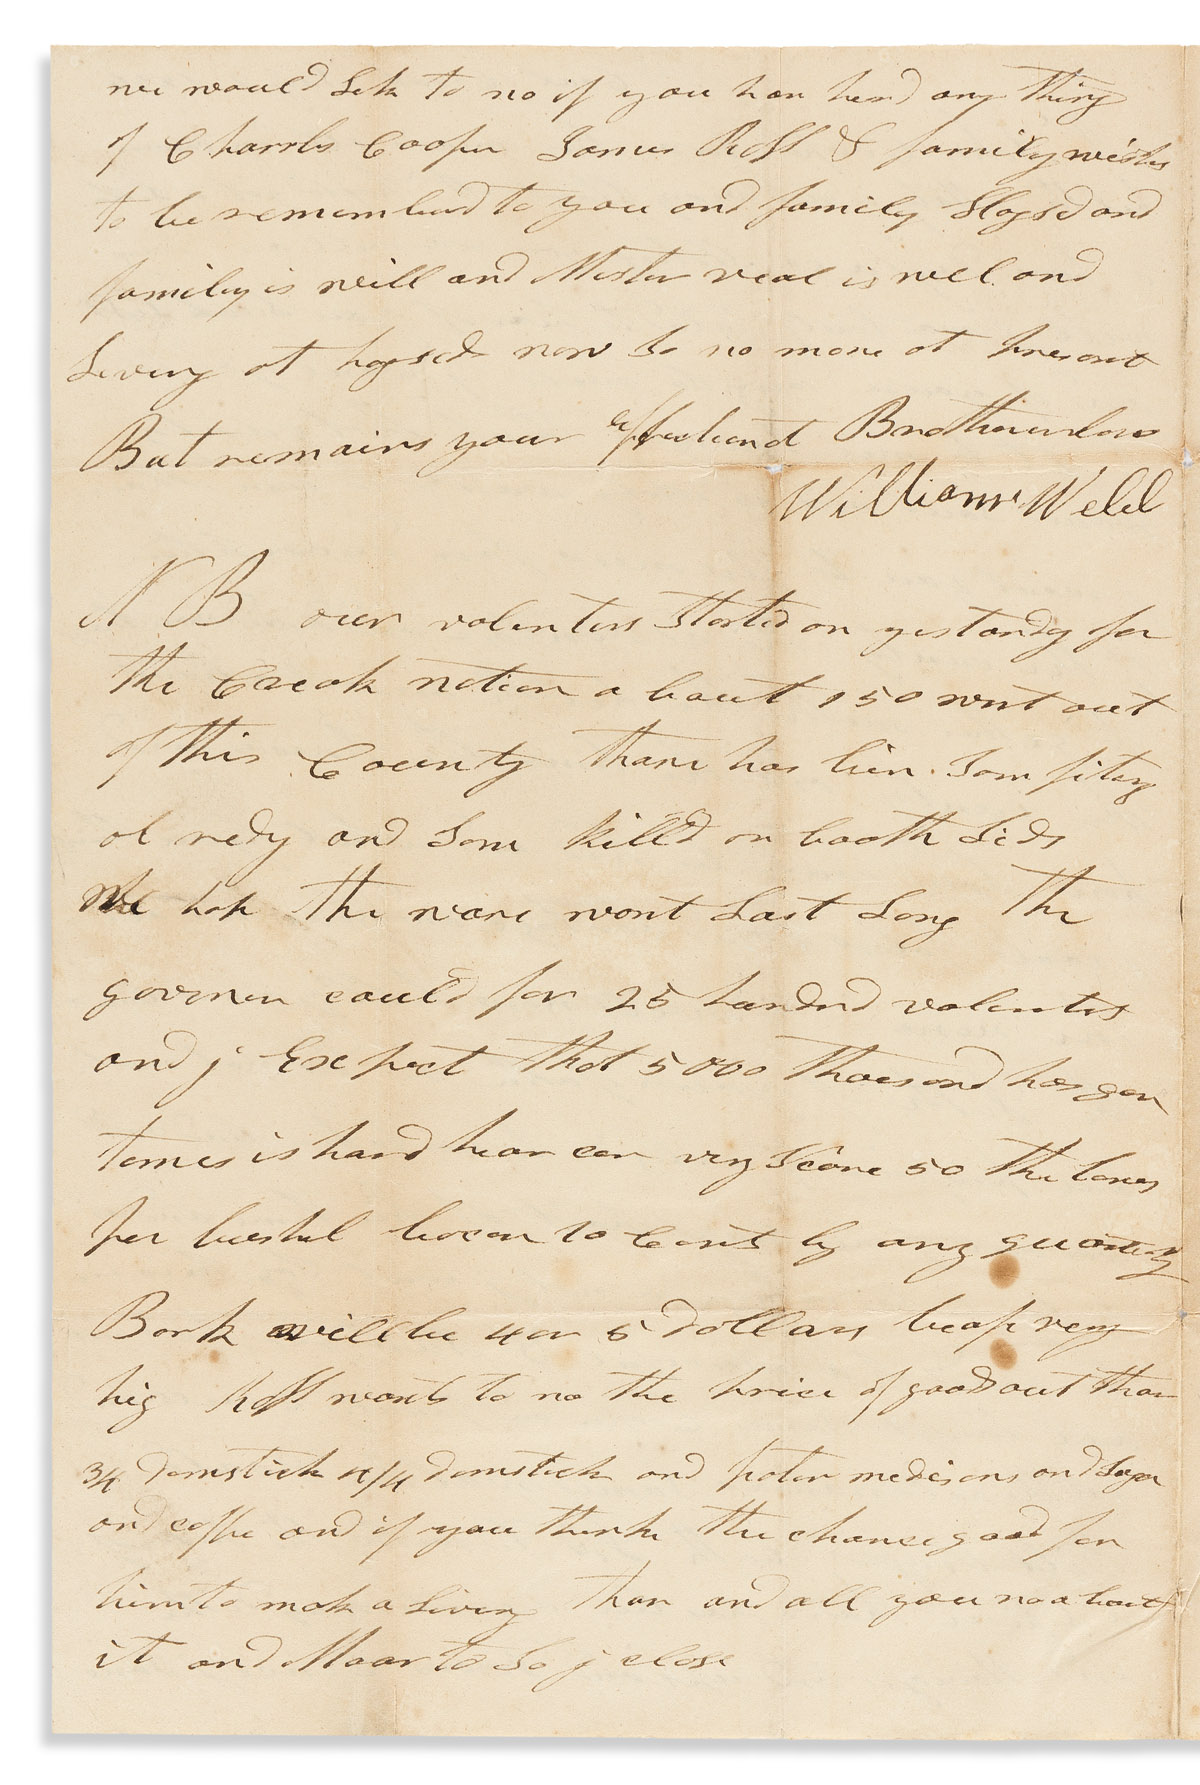 (AMERICAN INDIANS.) William Webb. Letter describing the Creek War of 1836.